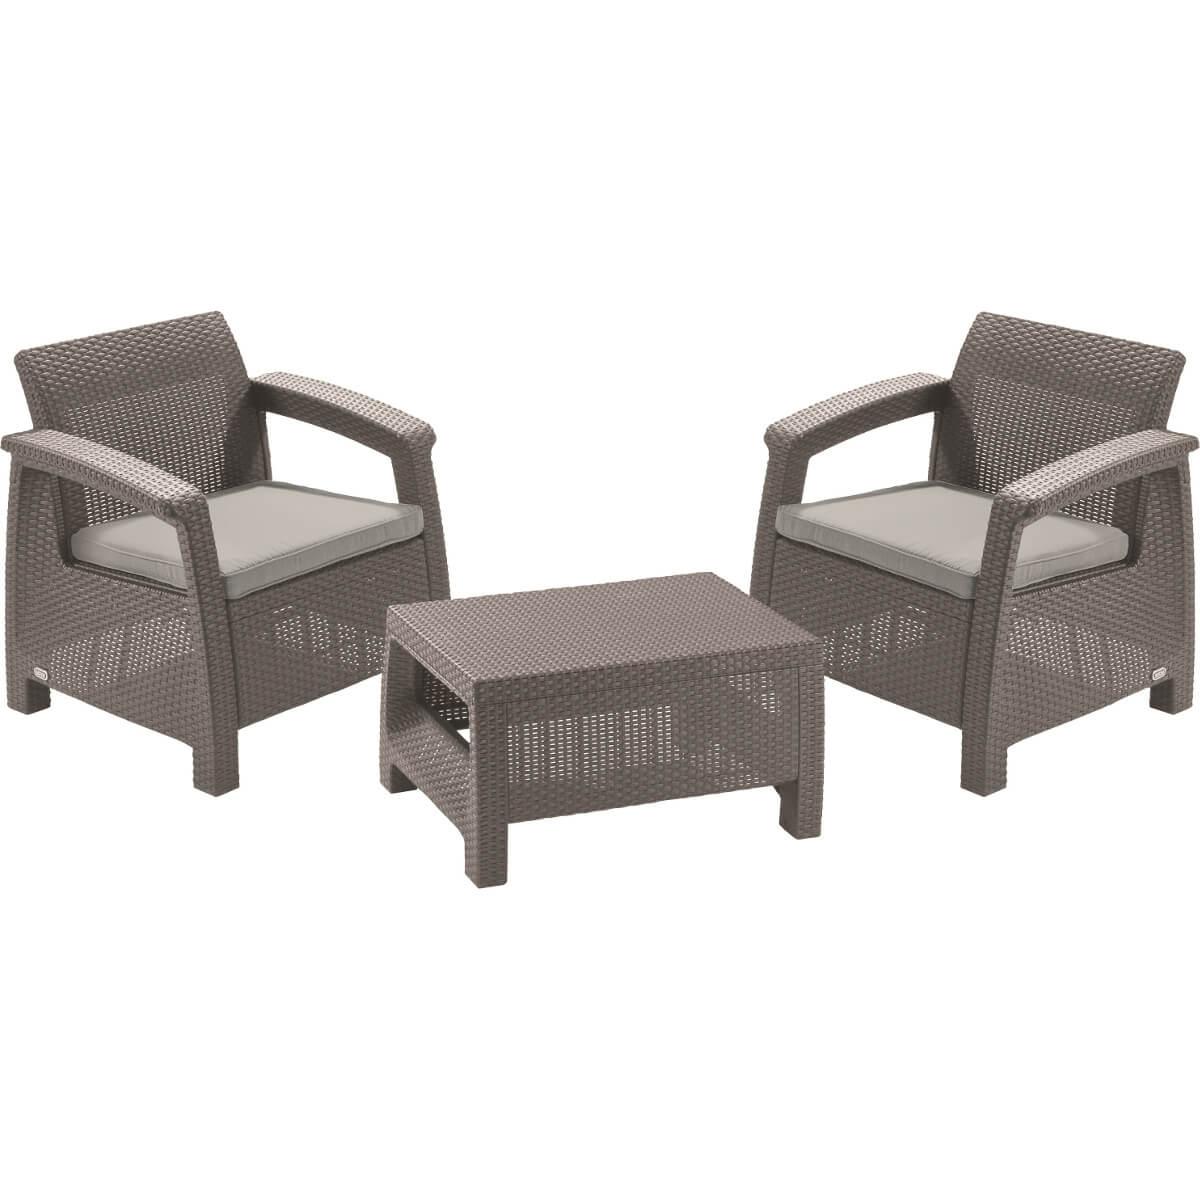 Комплект мебели Allibert Corfu Weekend 17197786